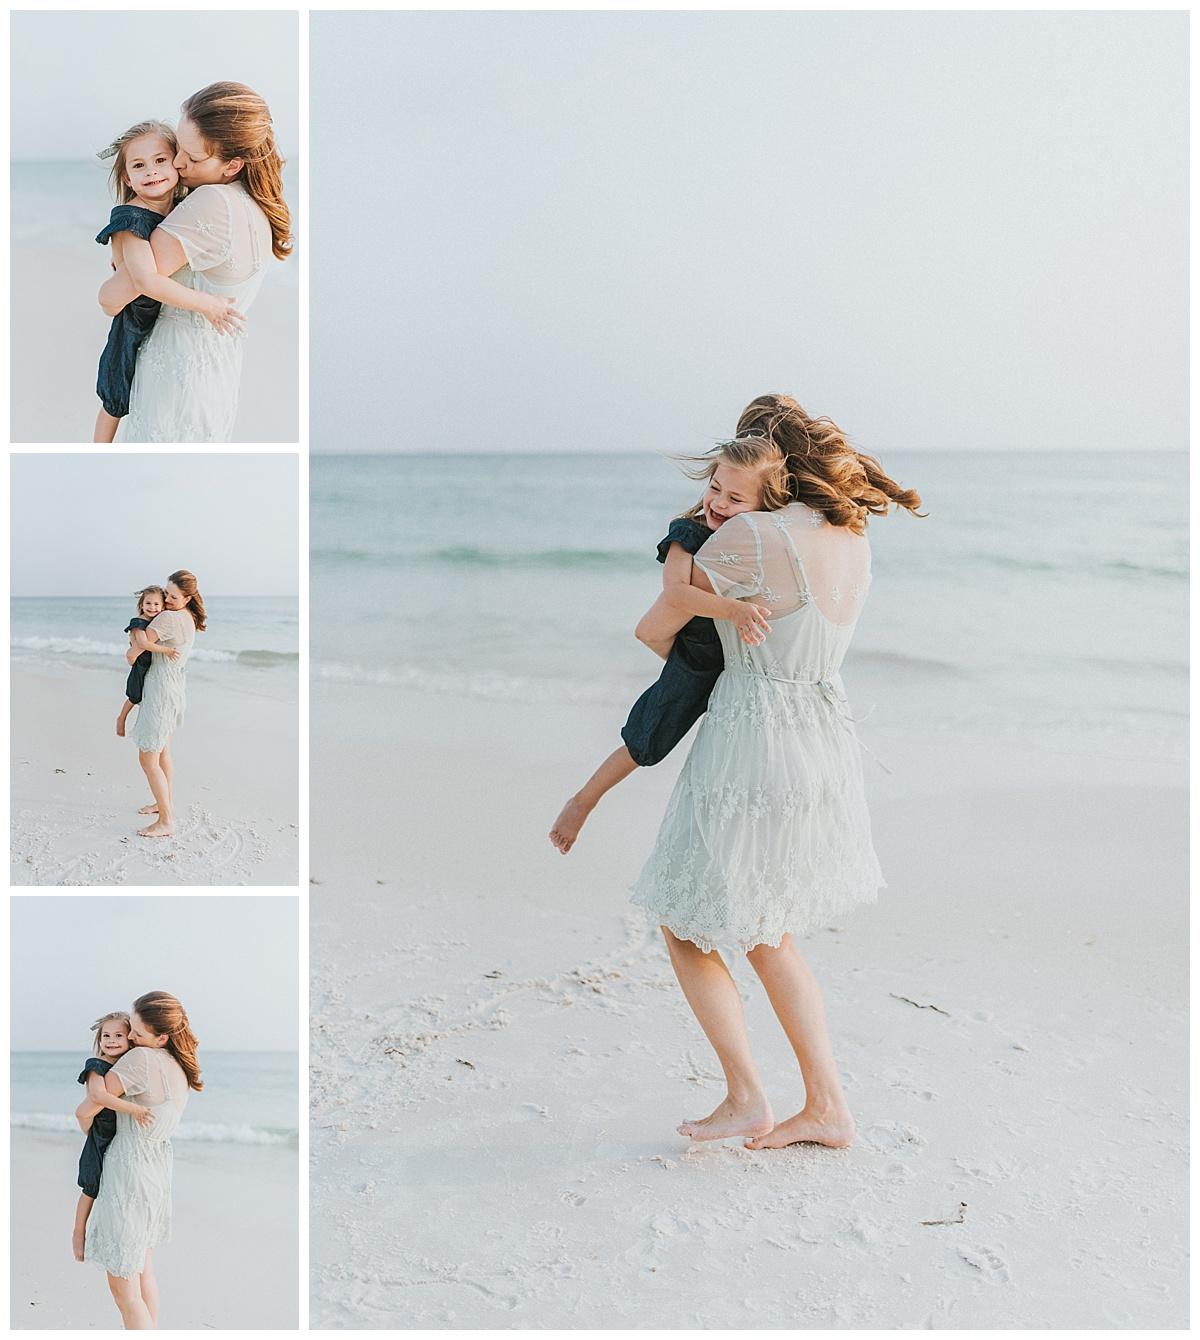 Love-Mary-Beth-Photography-Panama-City-New-Orleans-Charleston-Savannah-Wedding-Elopement_0122.jpg